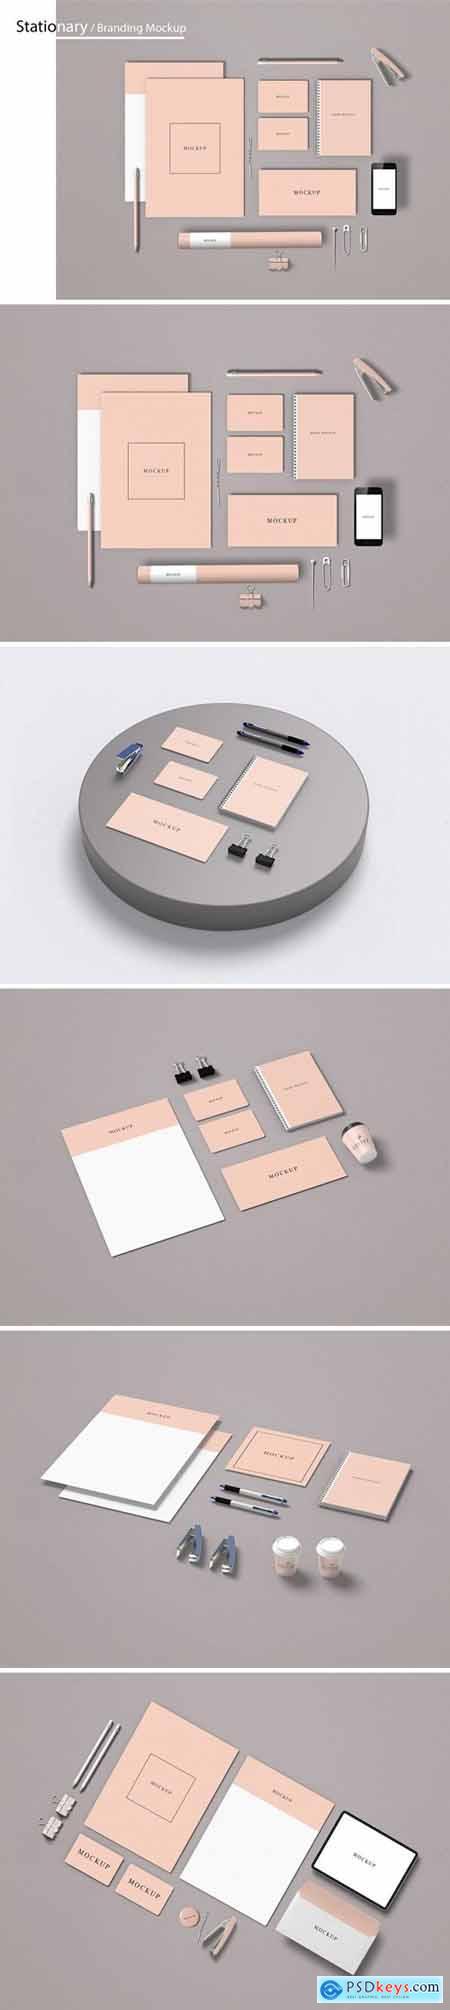 Stationery - Branding Mockups